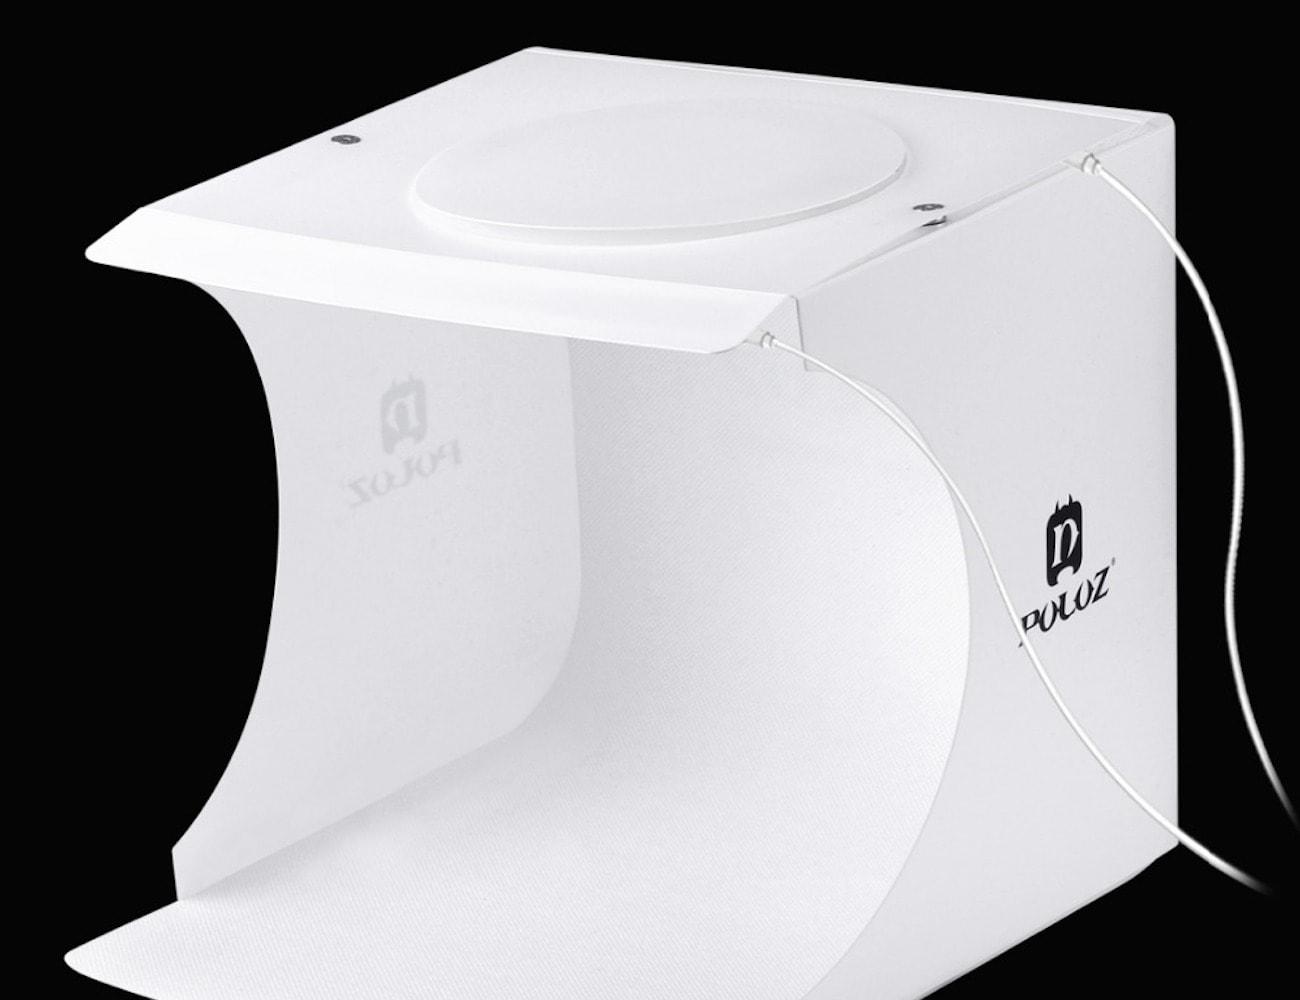 Foldable Photo Studio Lightbox